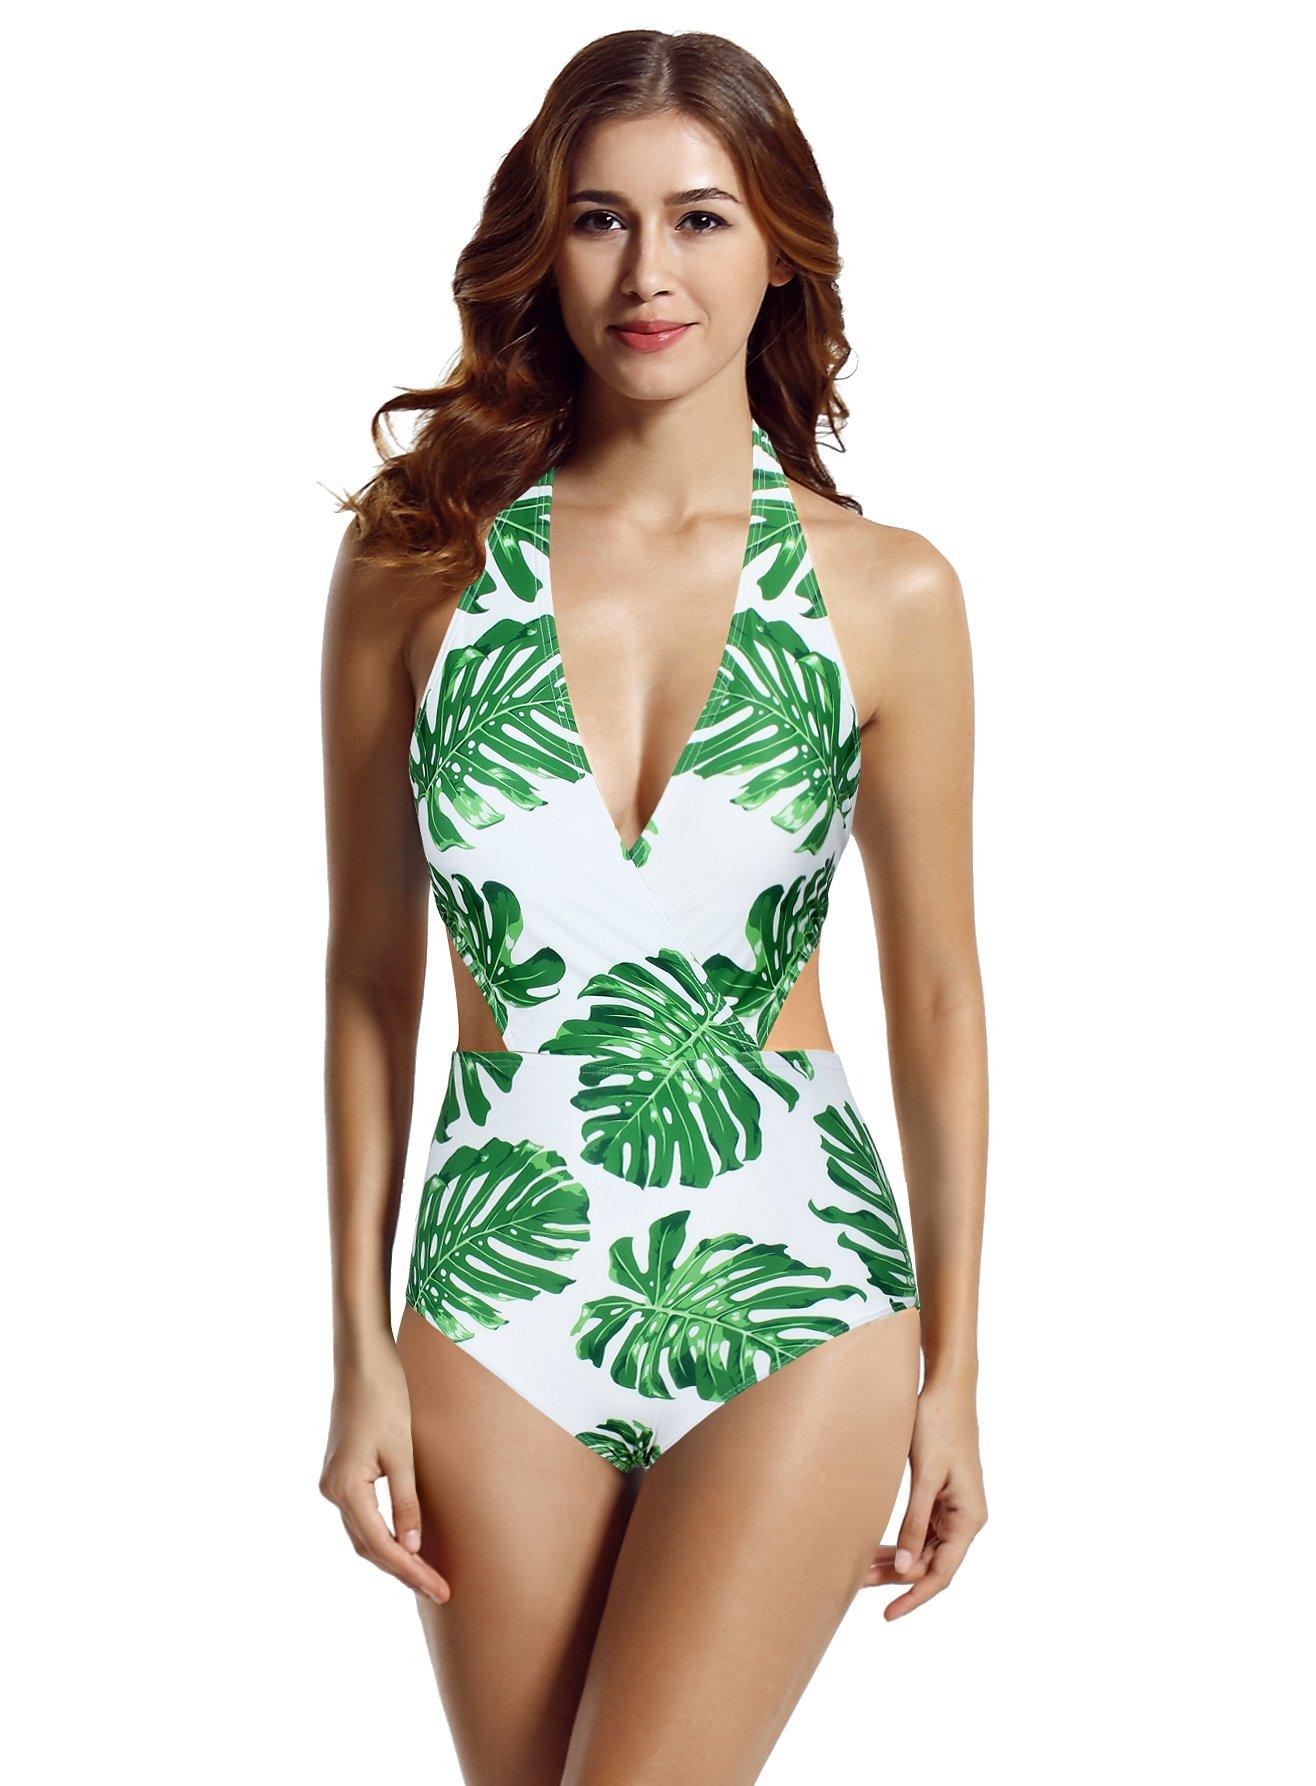 zeraca Women's Surplice Neckline High Waisted Halter One Piece Monokini Swimsuit (Tropical, Medium / 10)